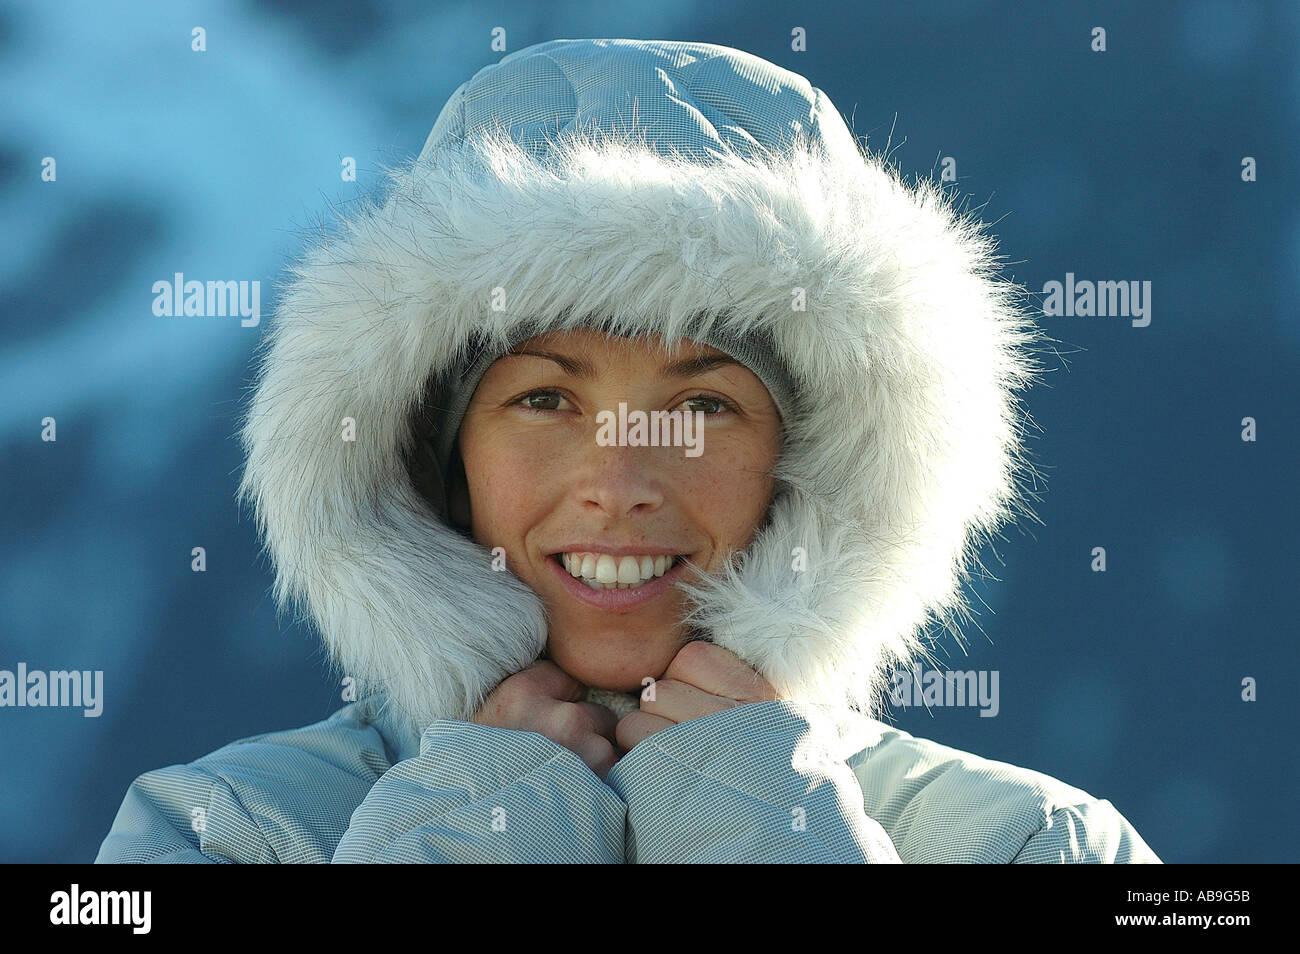 Greatcoat Stock Photos & Greatcoat Stock Images - Alamy